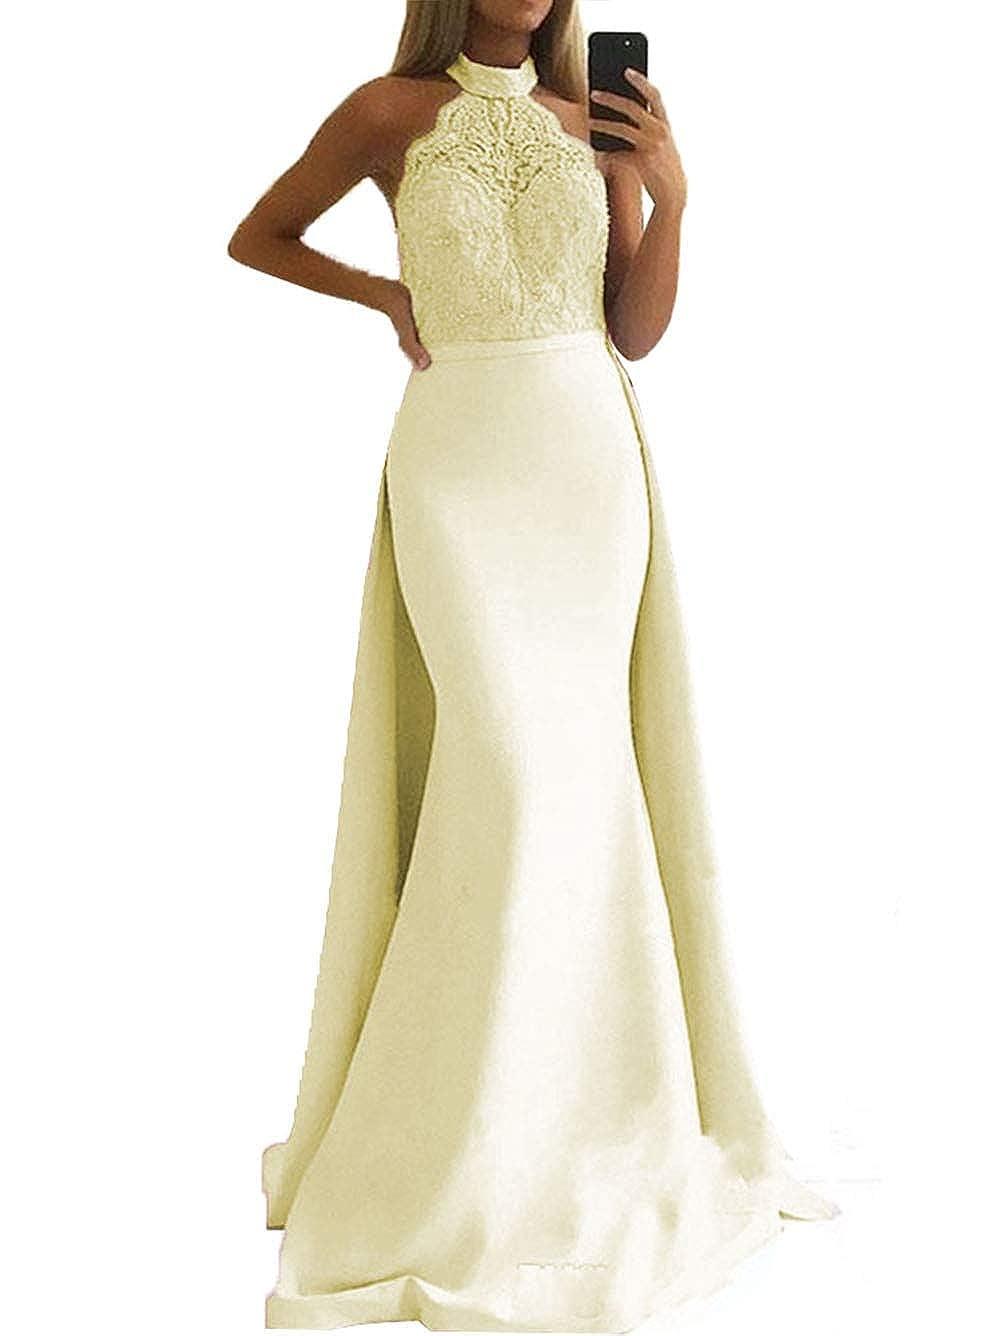 SDRESS Women's Lace Appliques Illusion Long Mermaid Skirt Bridesmaid Prom Dress